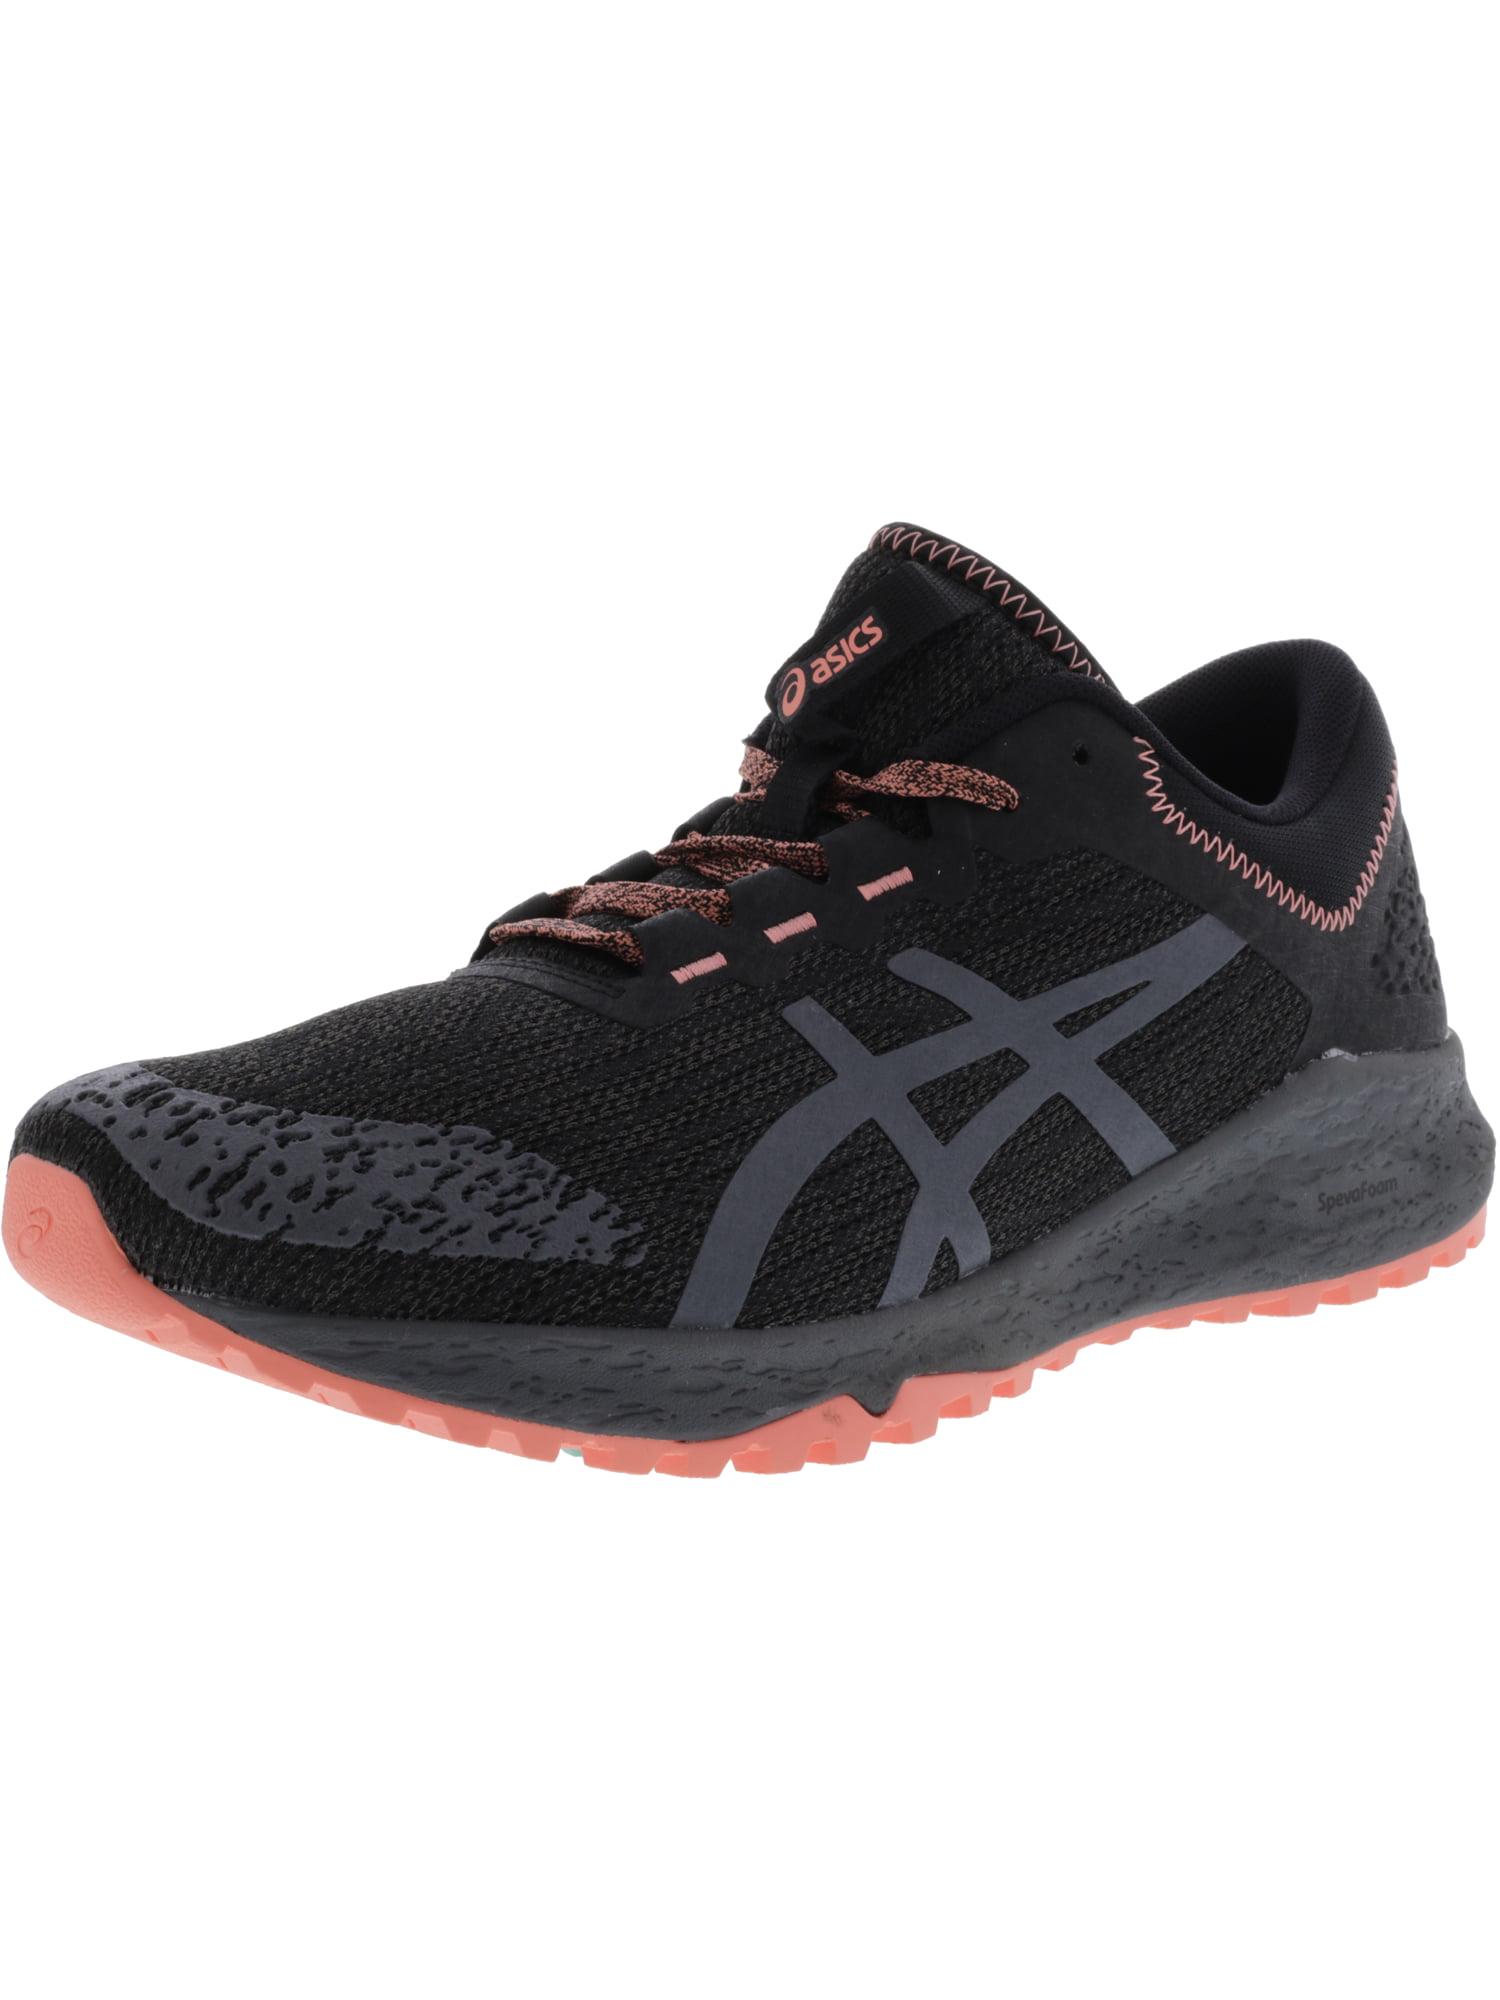 Asics Women's Alpine Xt Black / Carbon Begonia Pink Ankle-High Running Shoe - 10M